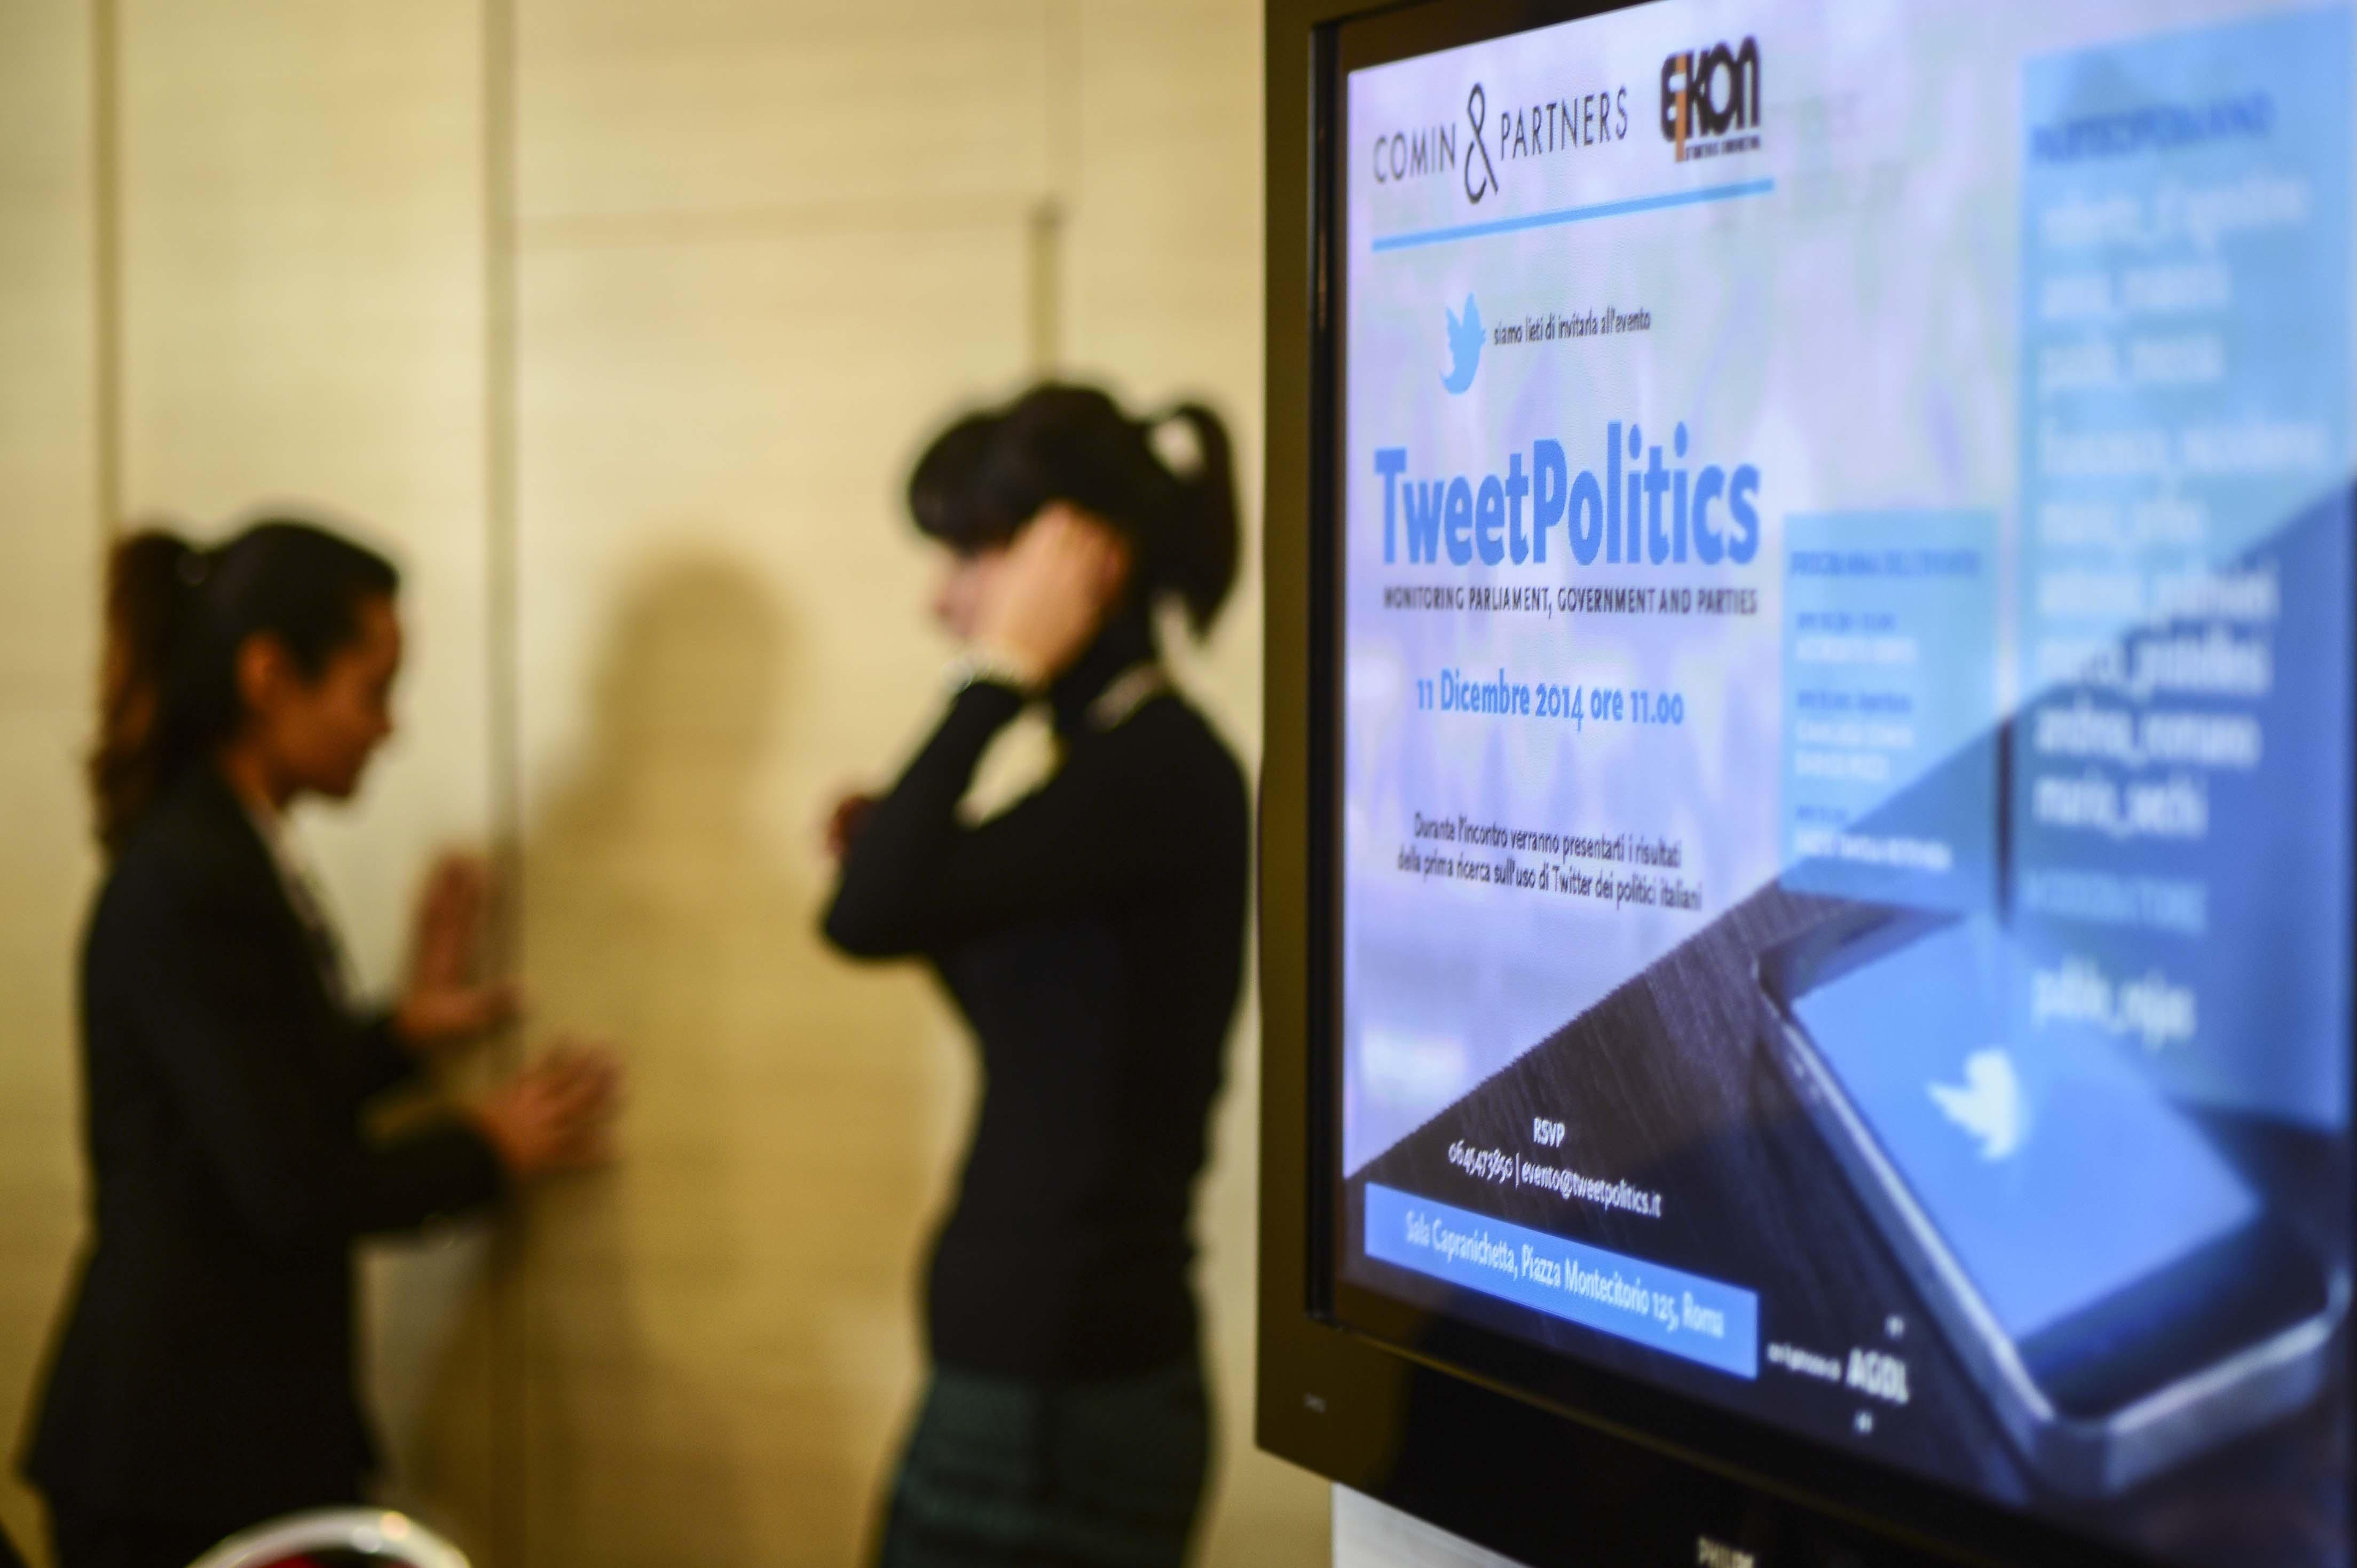 Tweetpolitics come usano twitter i politici italiani for Nomi politici italiani